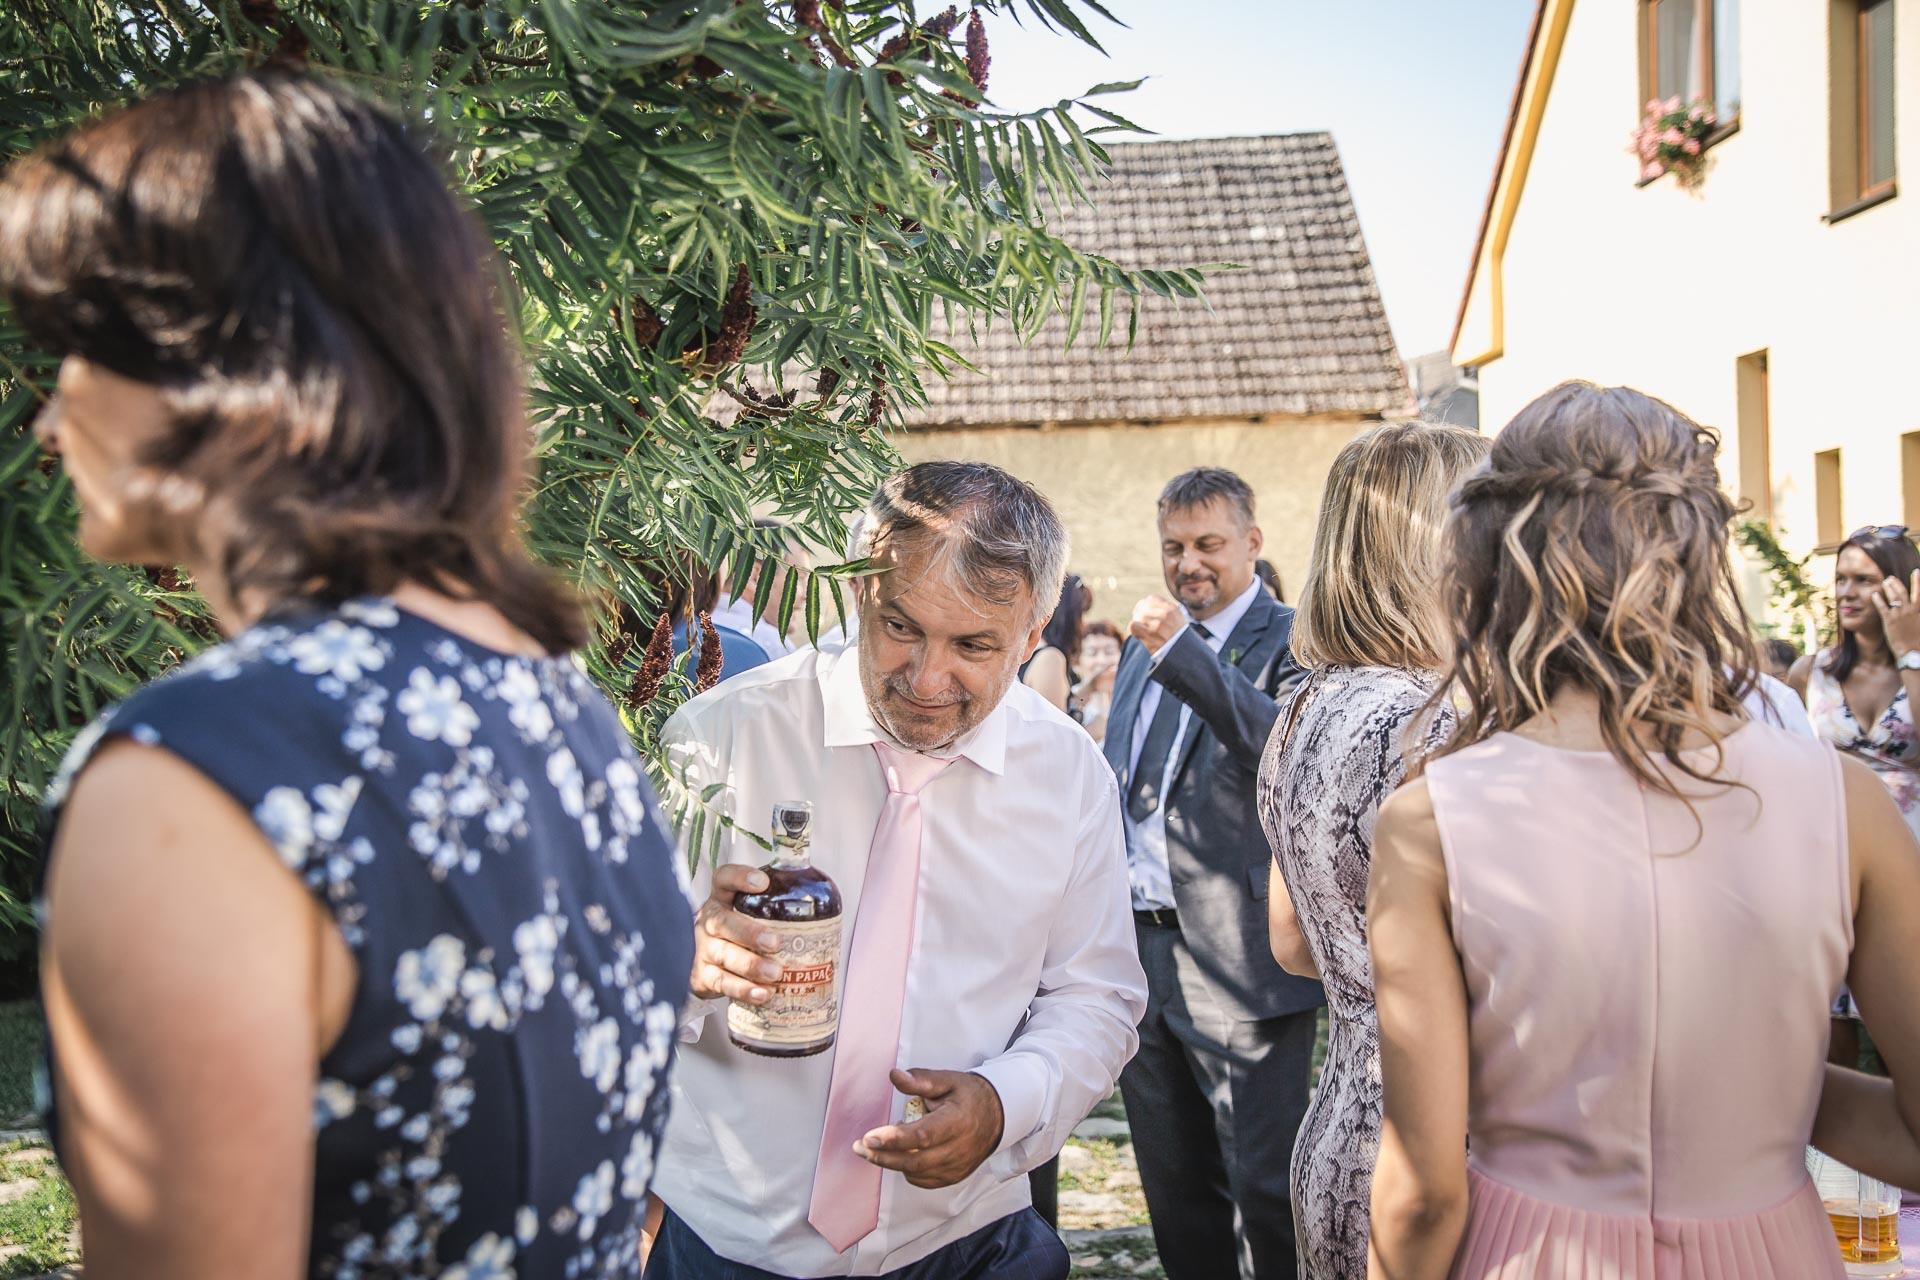 svatební-fotograf-wedding-svatebni-video-orlík-vltava-kostel-statek-stodola-boho-svatba-Beautyfoto-97